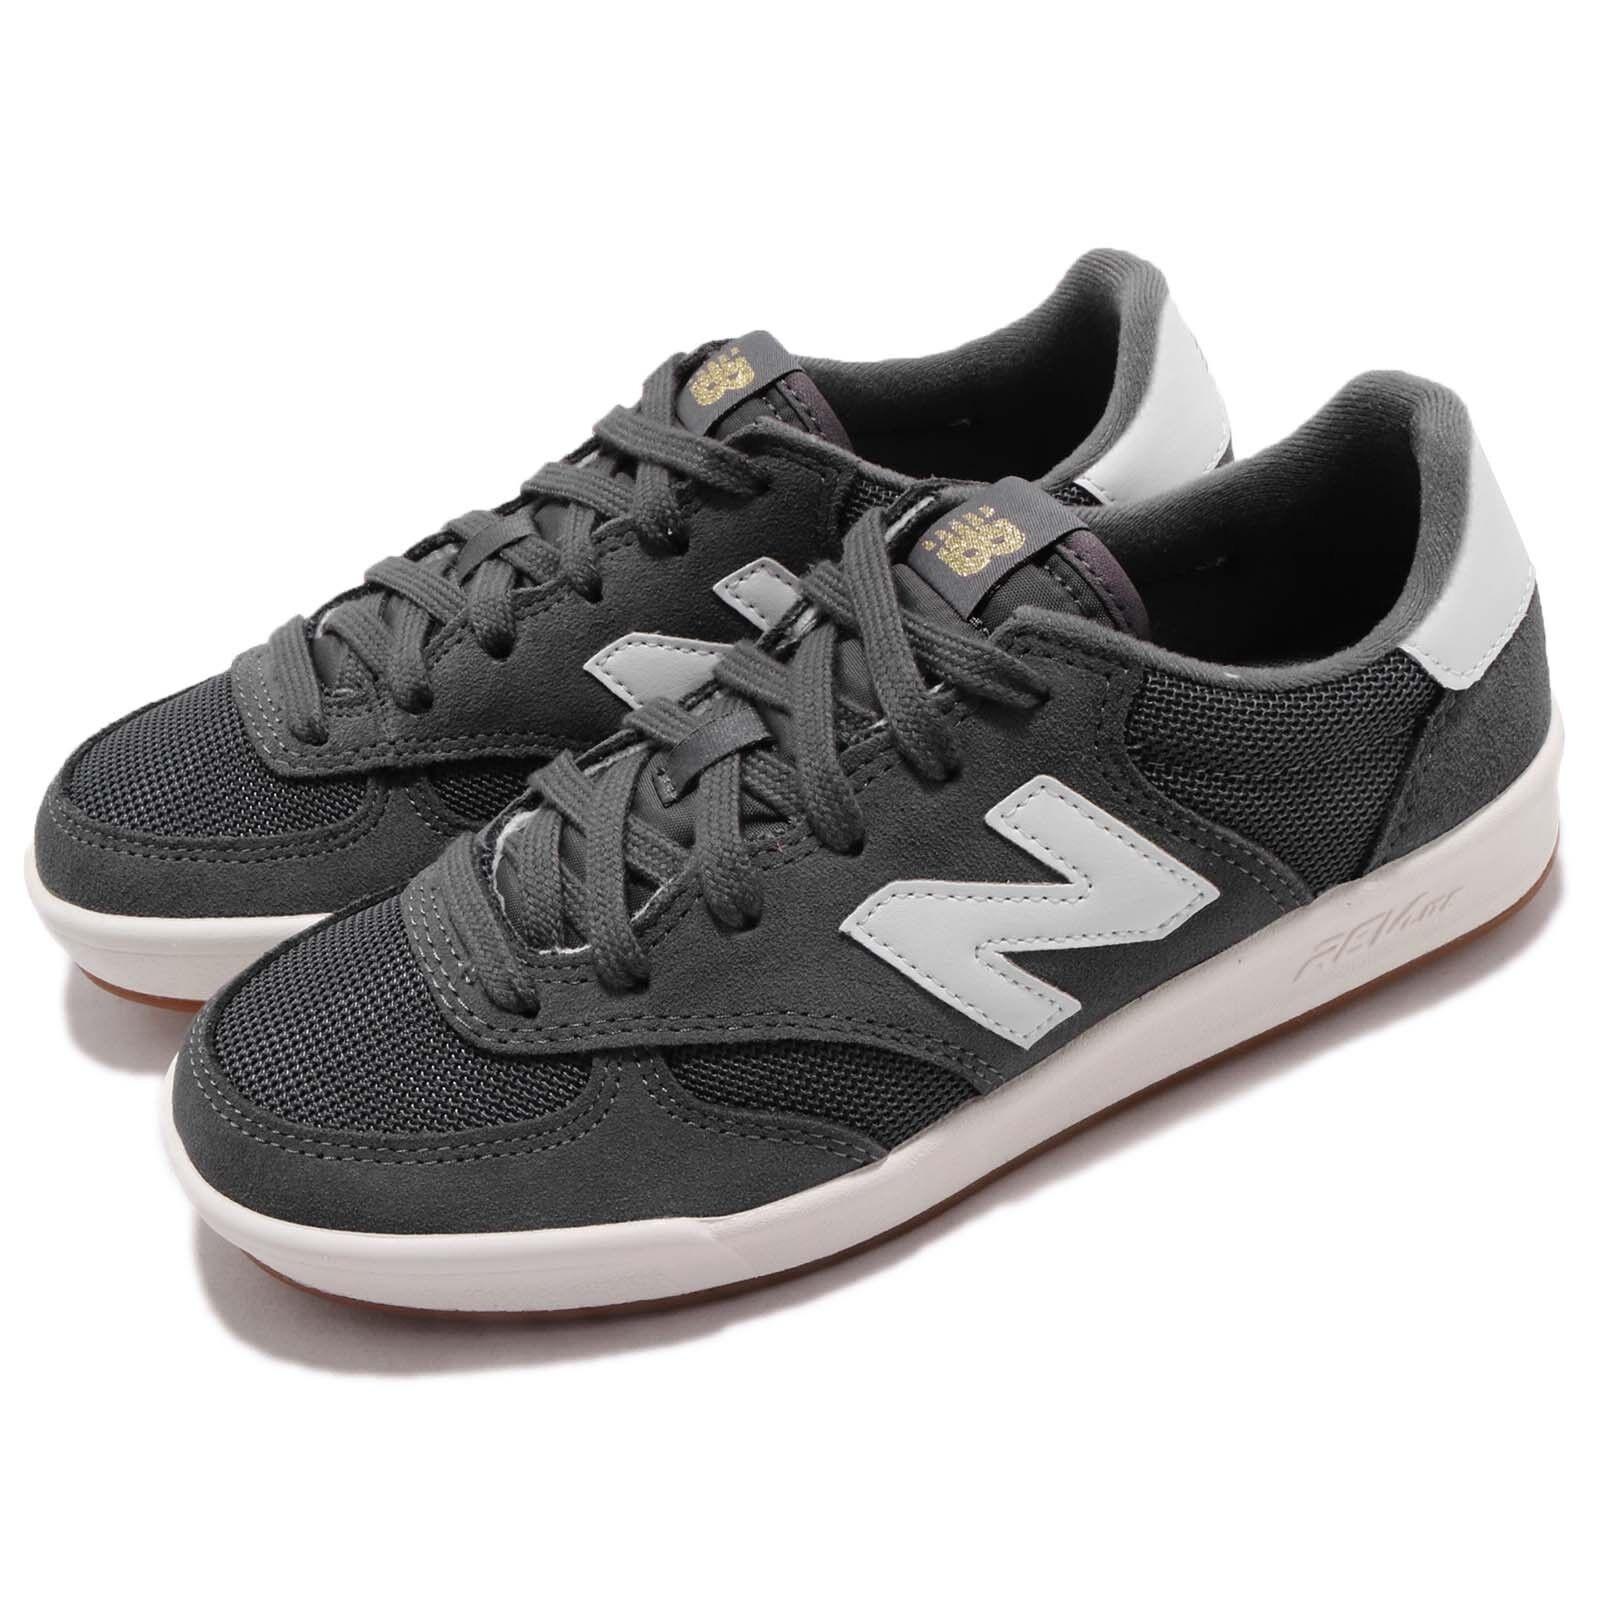 New New New Balance WRT300 gris blanco mujer Lifestyle Casual zapatos WRT300FG B  entrega rápida